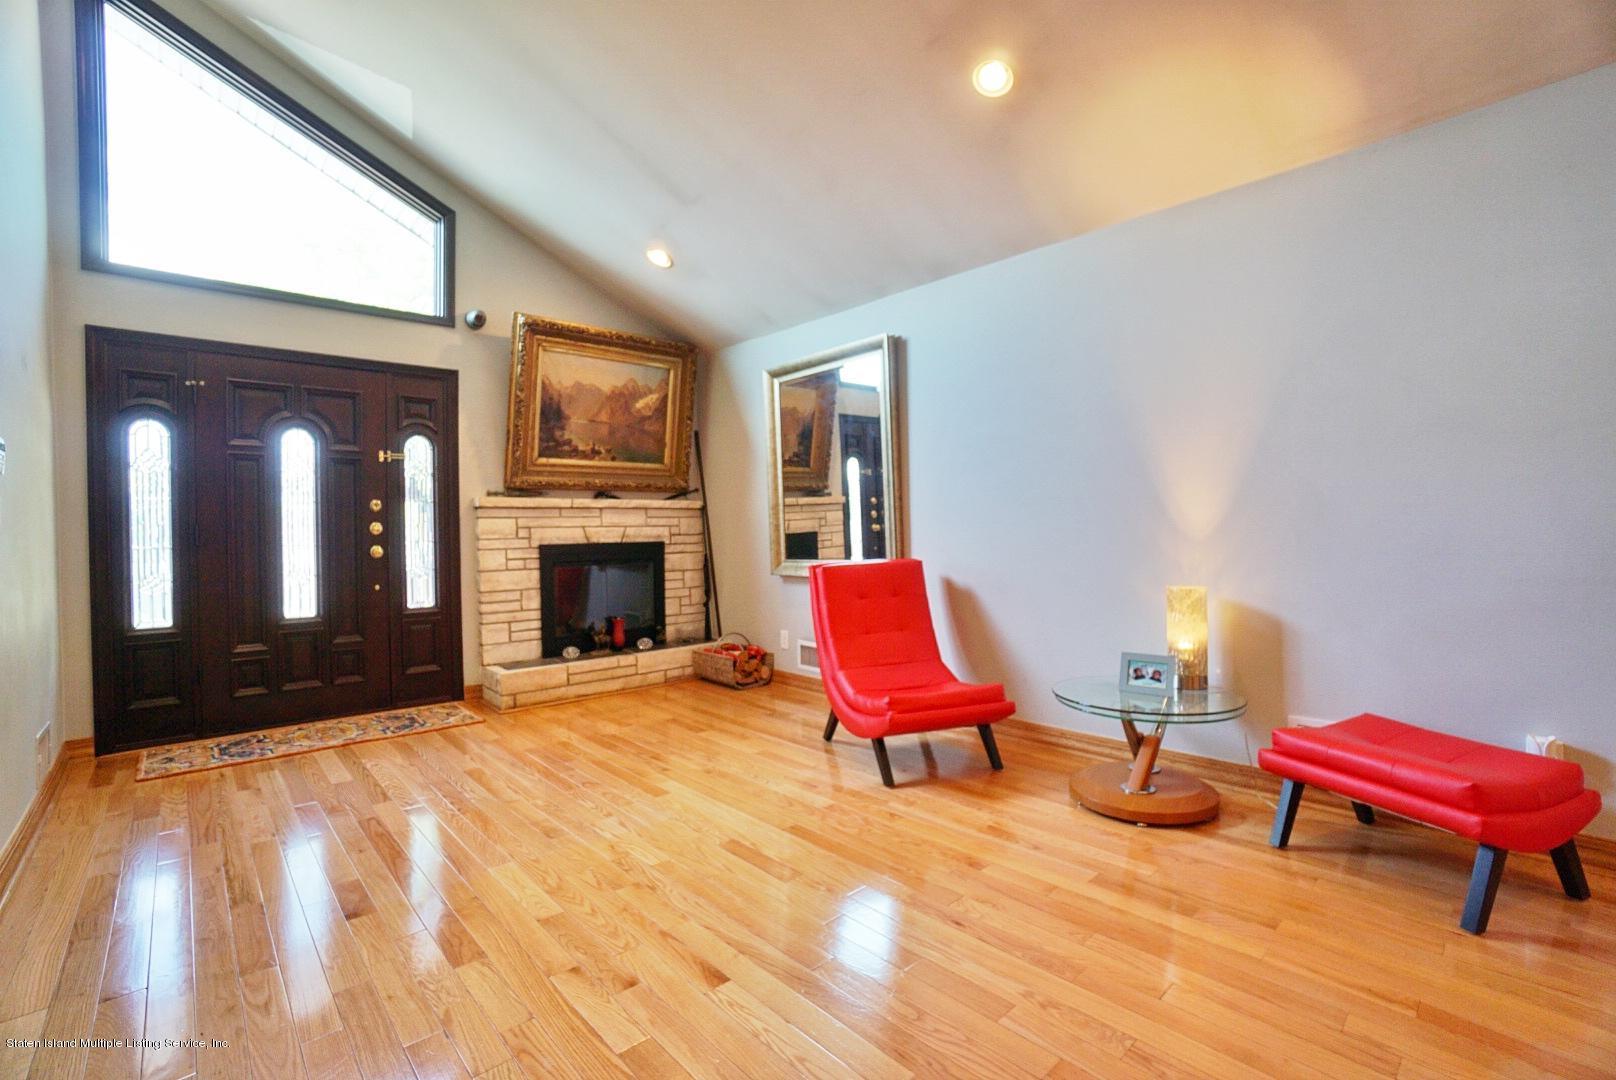 Single Family - Detached 48 Ocean Terrace  Staten Island, NY 10314, MLS-1130826-12